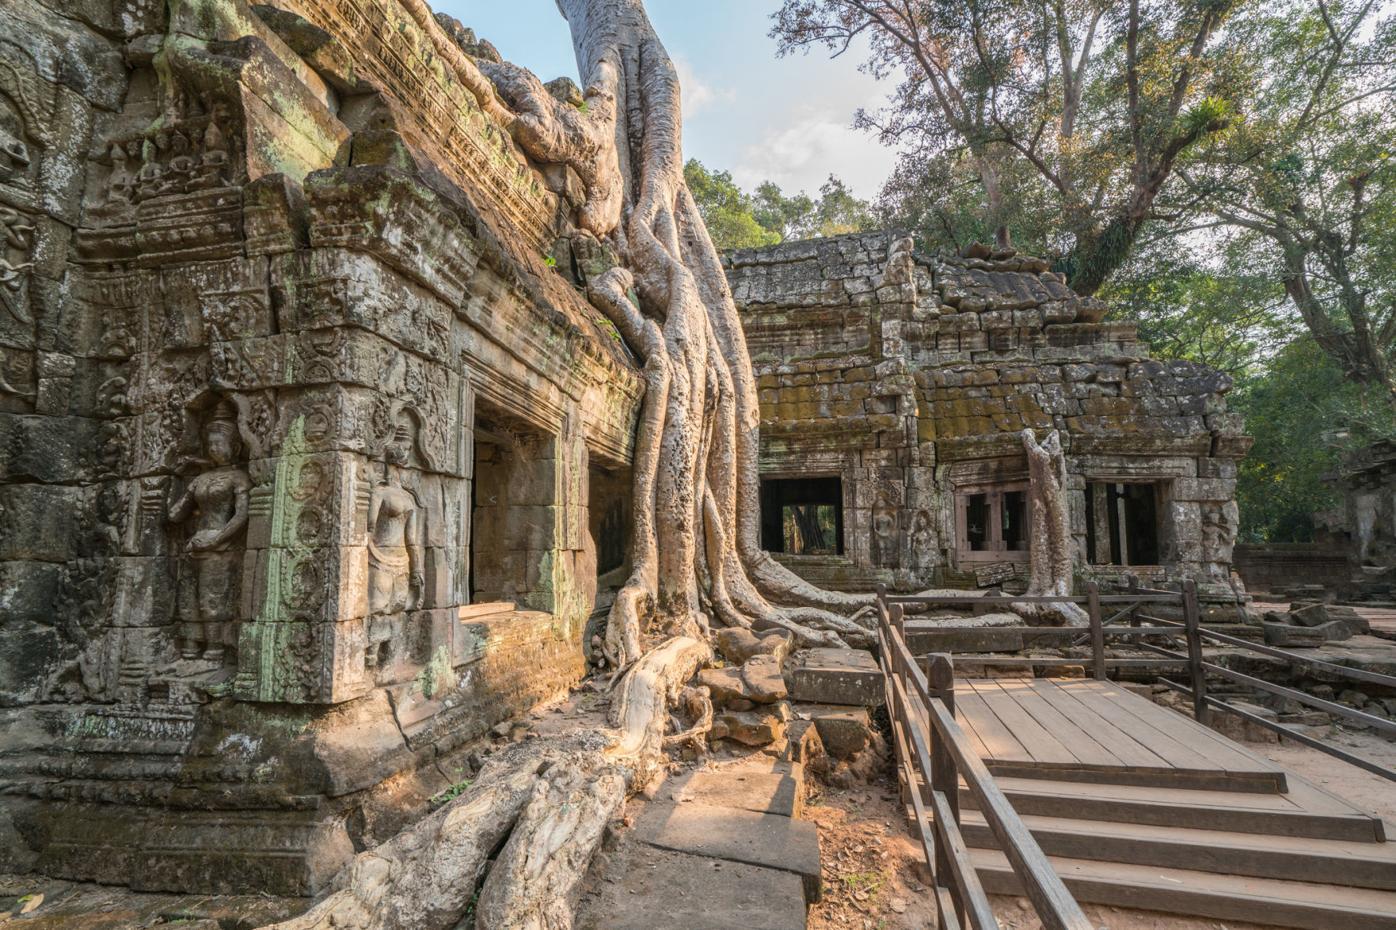 The temples at Angkor Wat: Cambodia's jewel